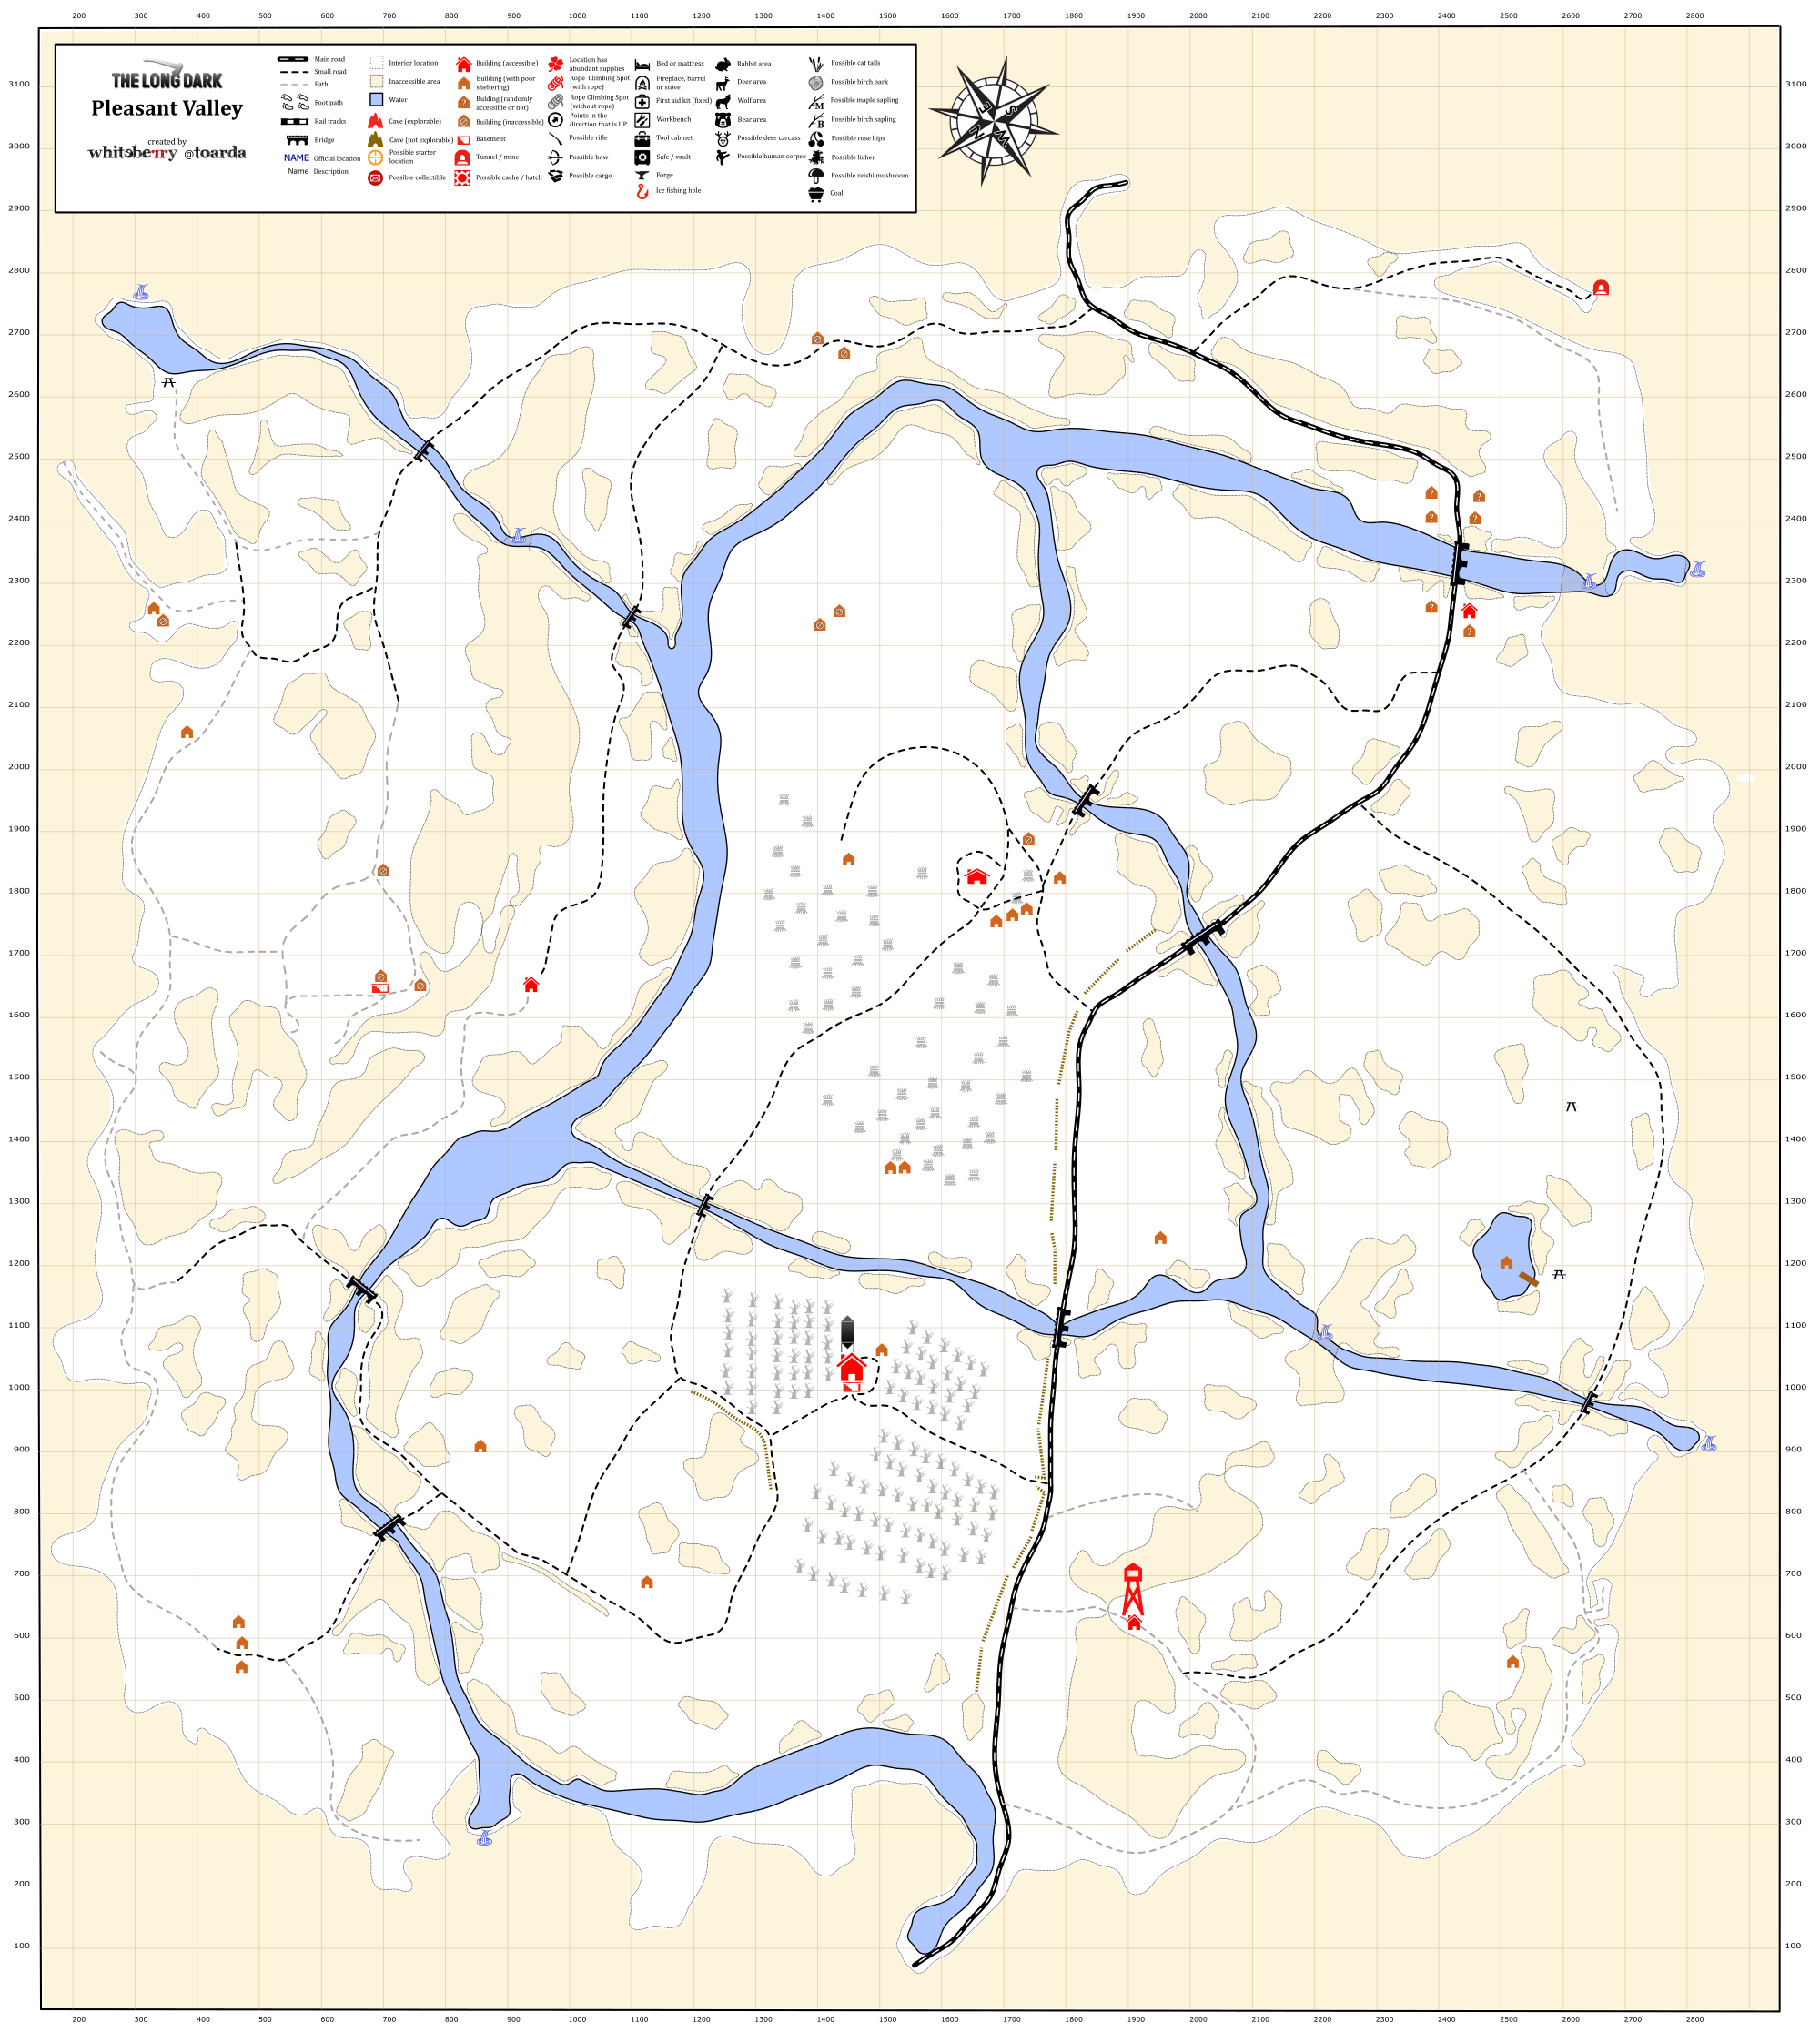 Komunita sluby Steam  Nvod  Detailed Region Maps  The Long Dark